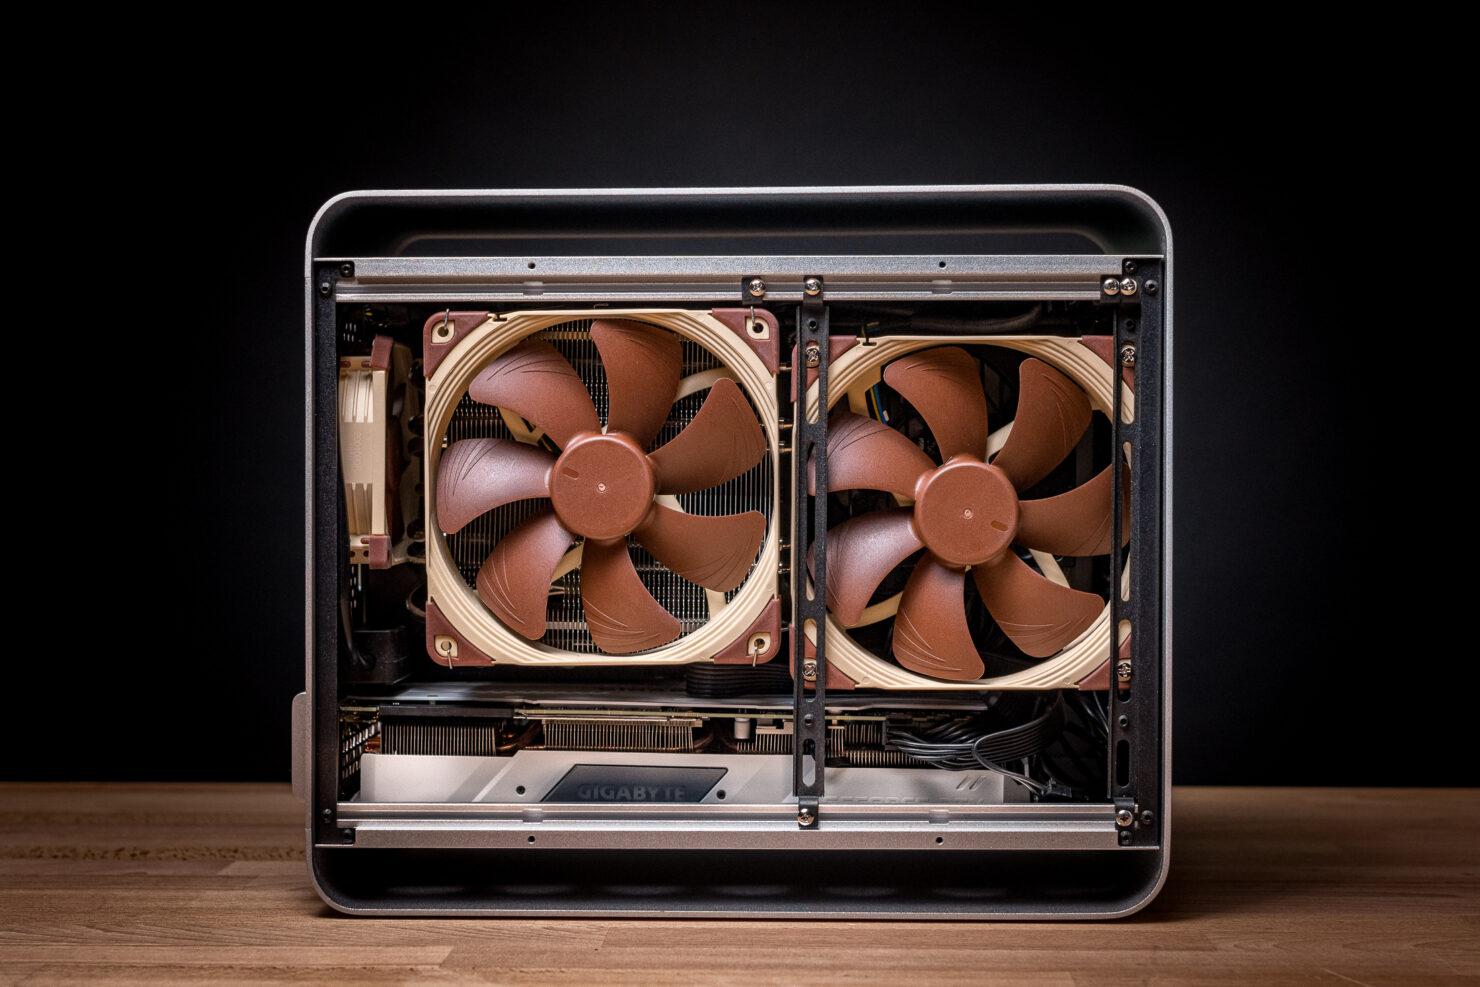 amd-ryzen-9-3900x-nvidia-geforce-rtx-2070-super-sff-pc-build_streamcom-da2-chassis_4